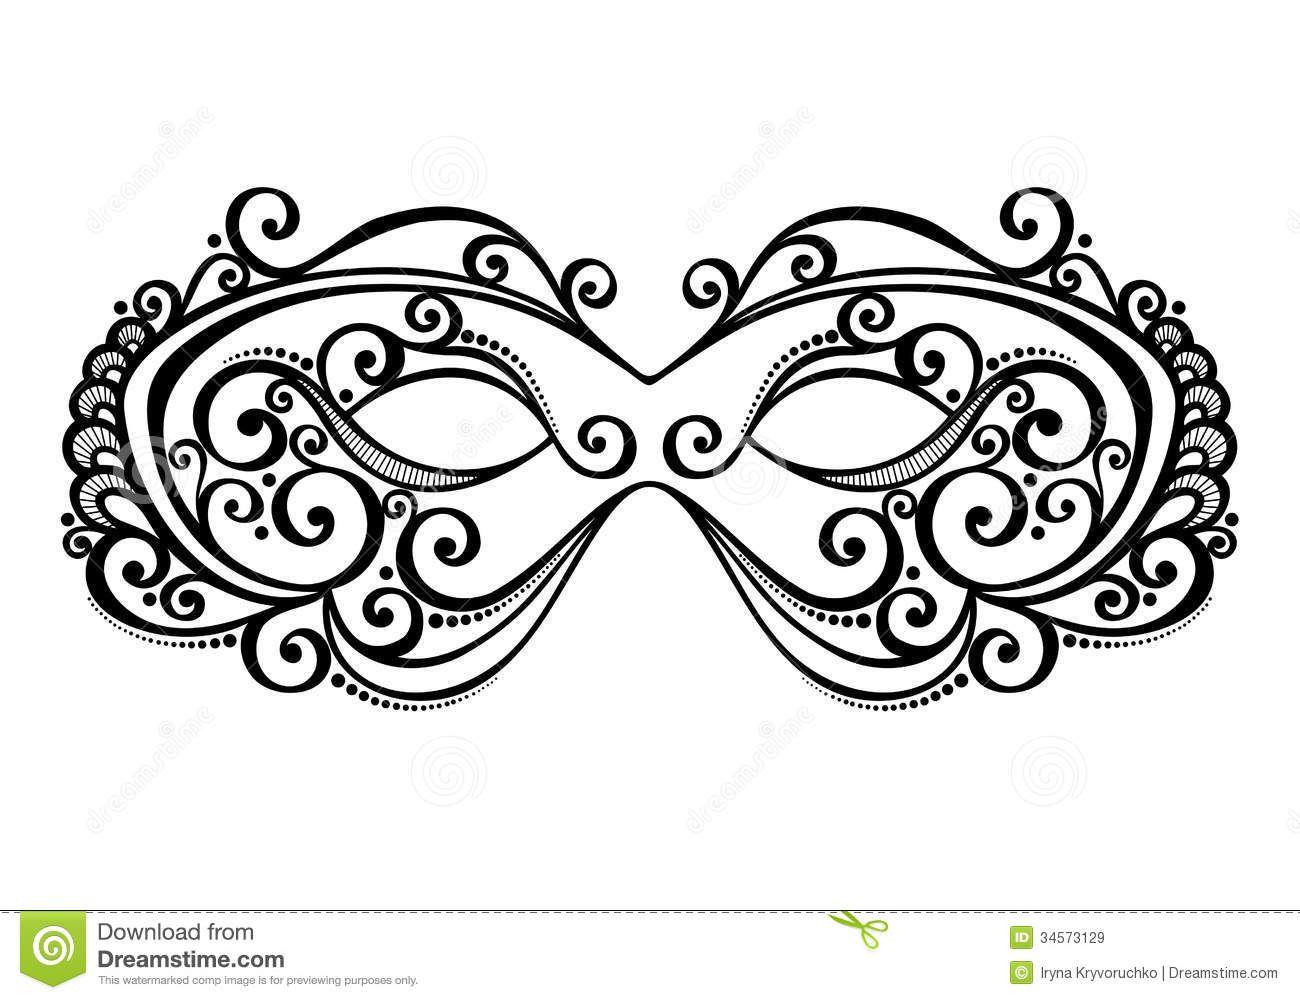 masquerademaskbeautifulvectorpatterneddesign34573129